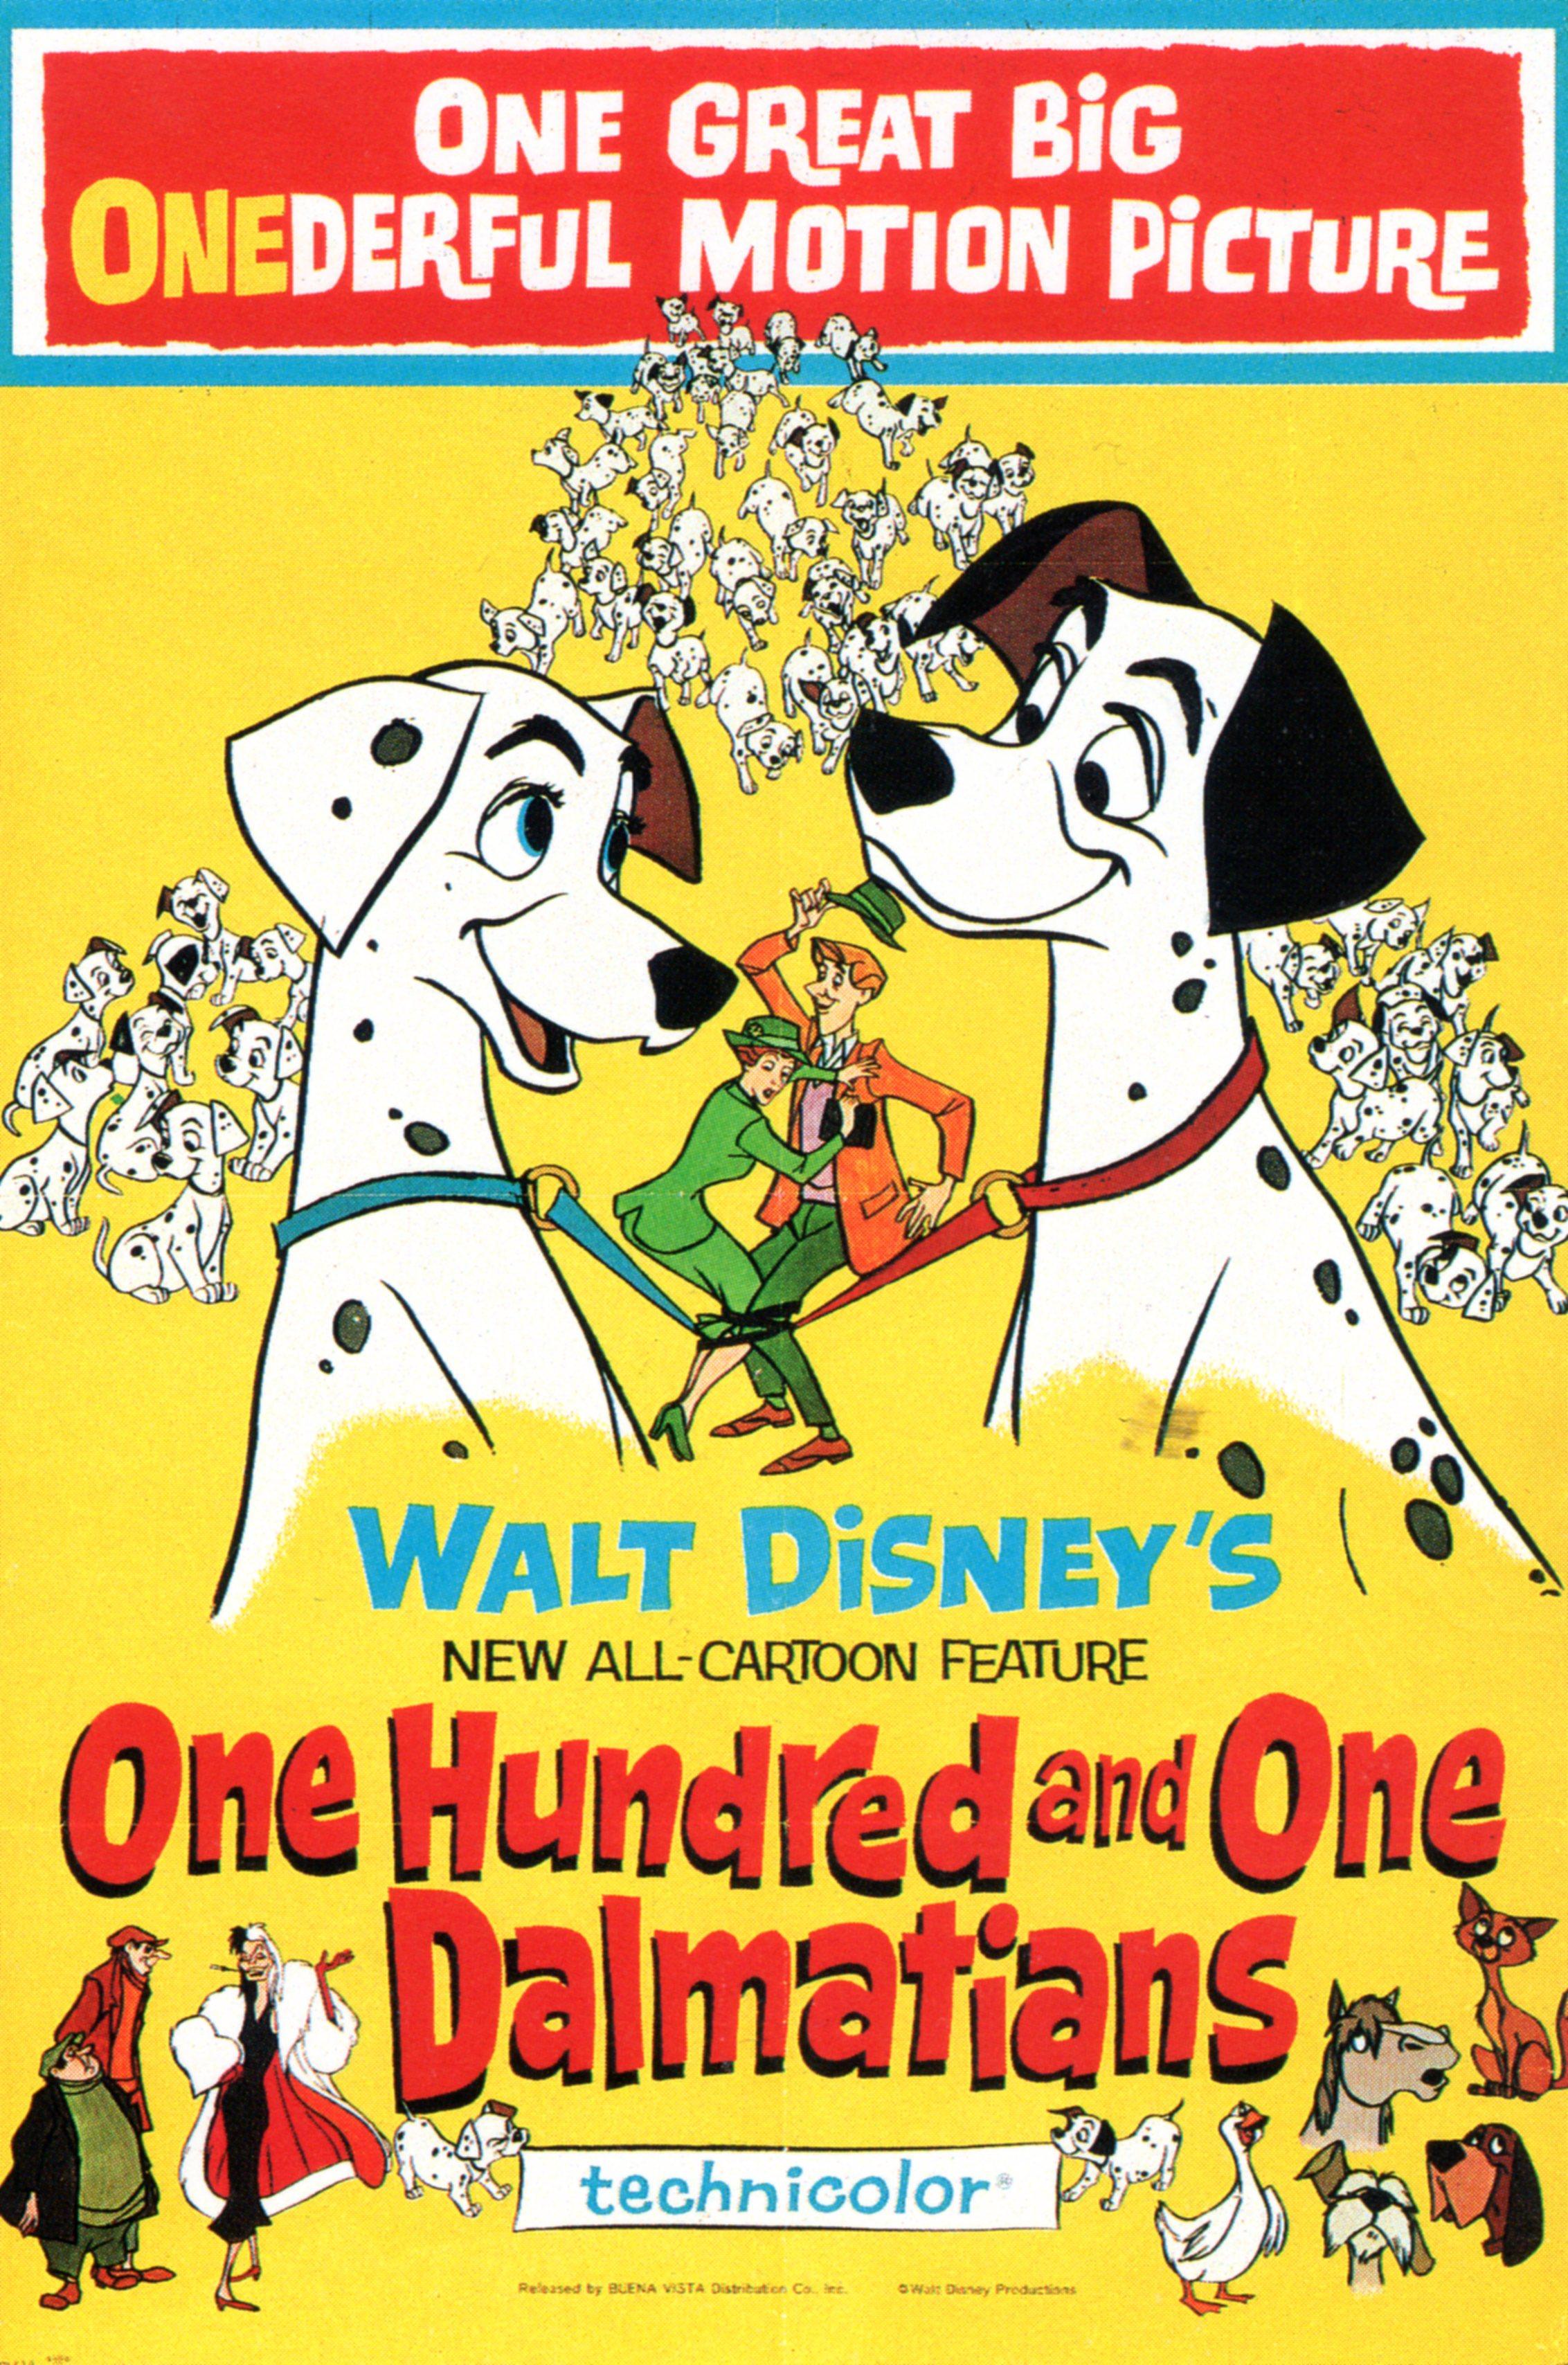 One Hundred and One Dalmatians | Disney Wiki | FANDOM powered by Wikia